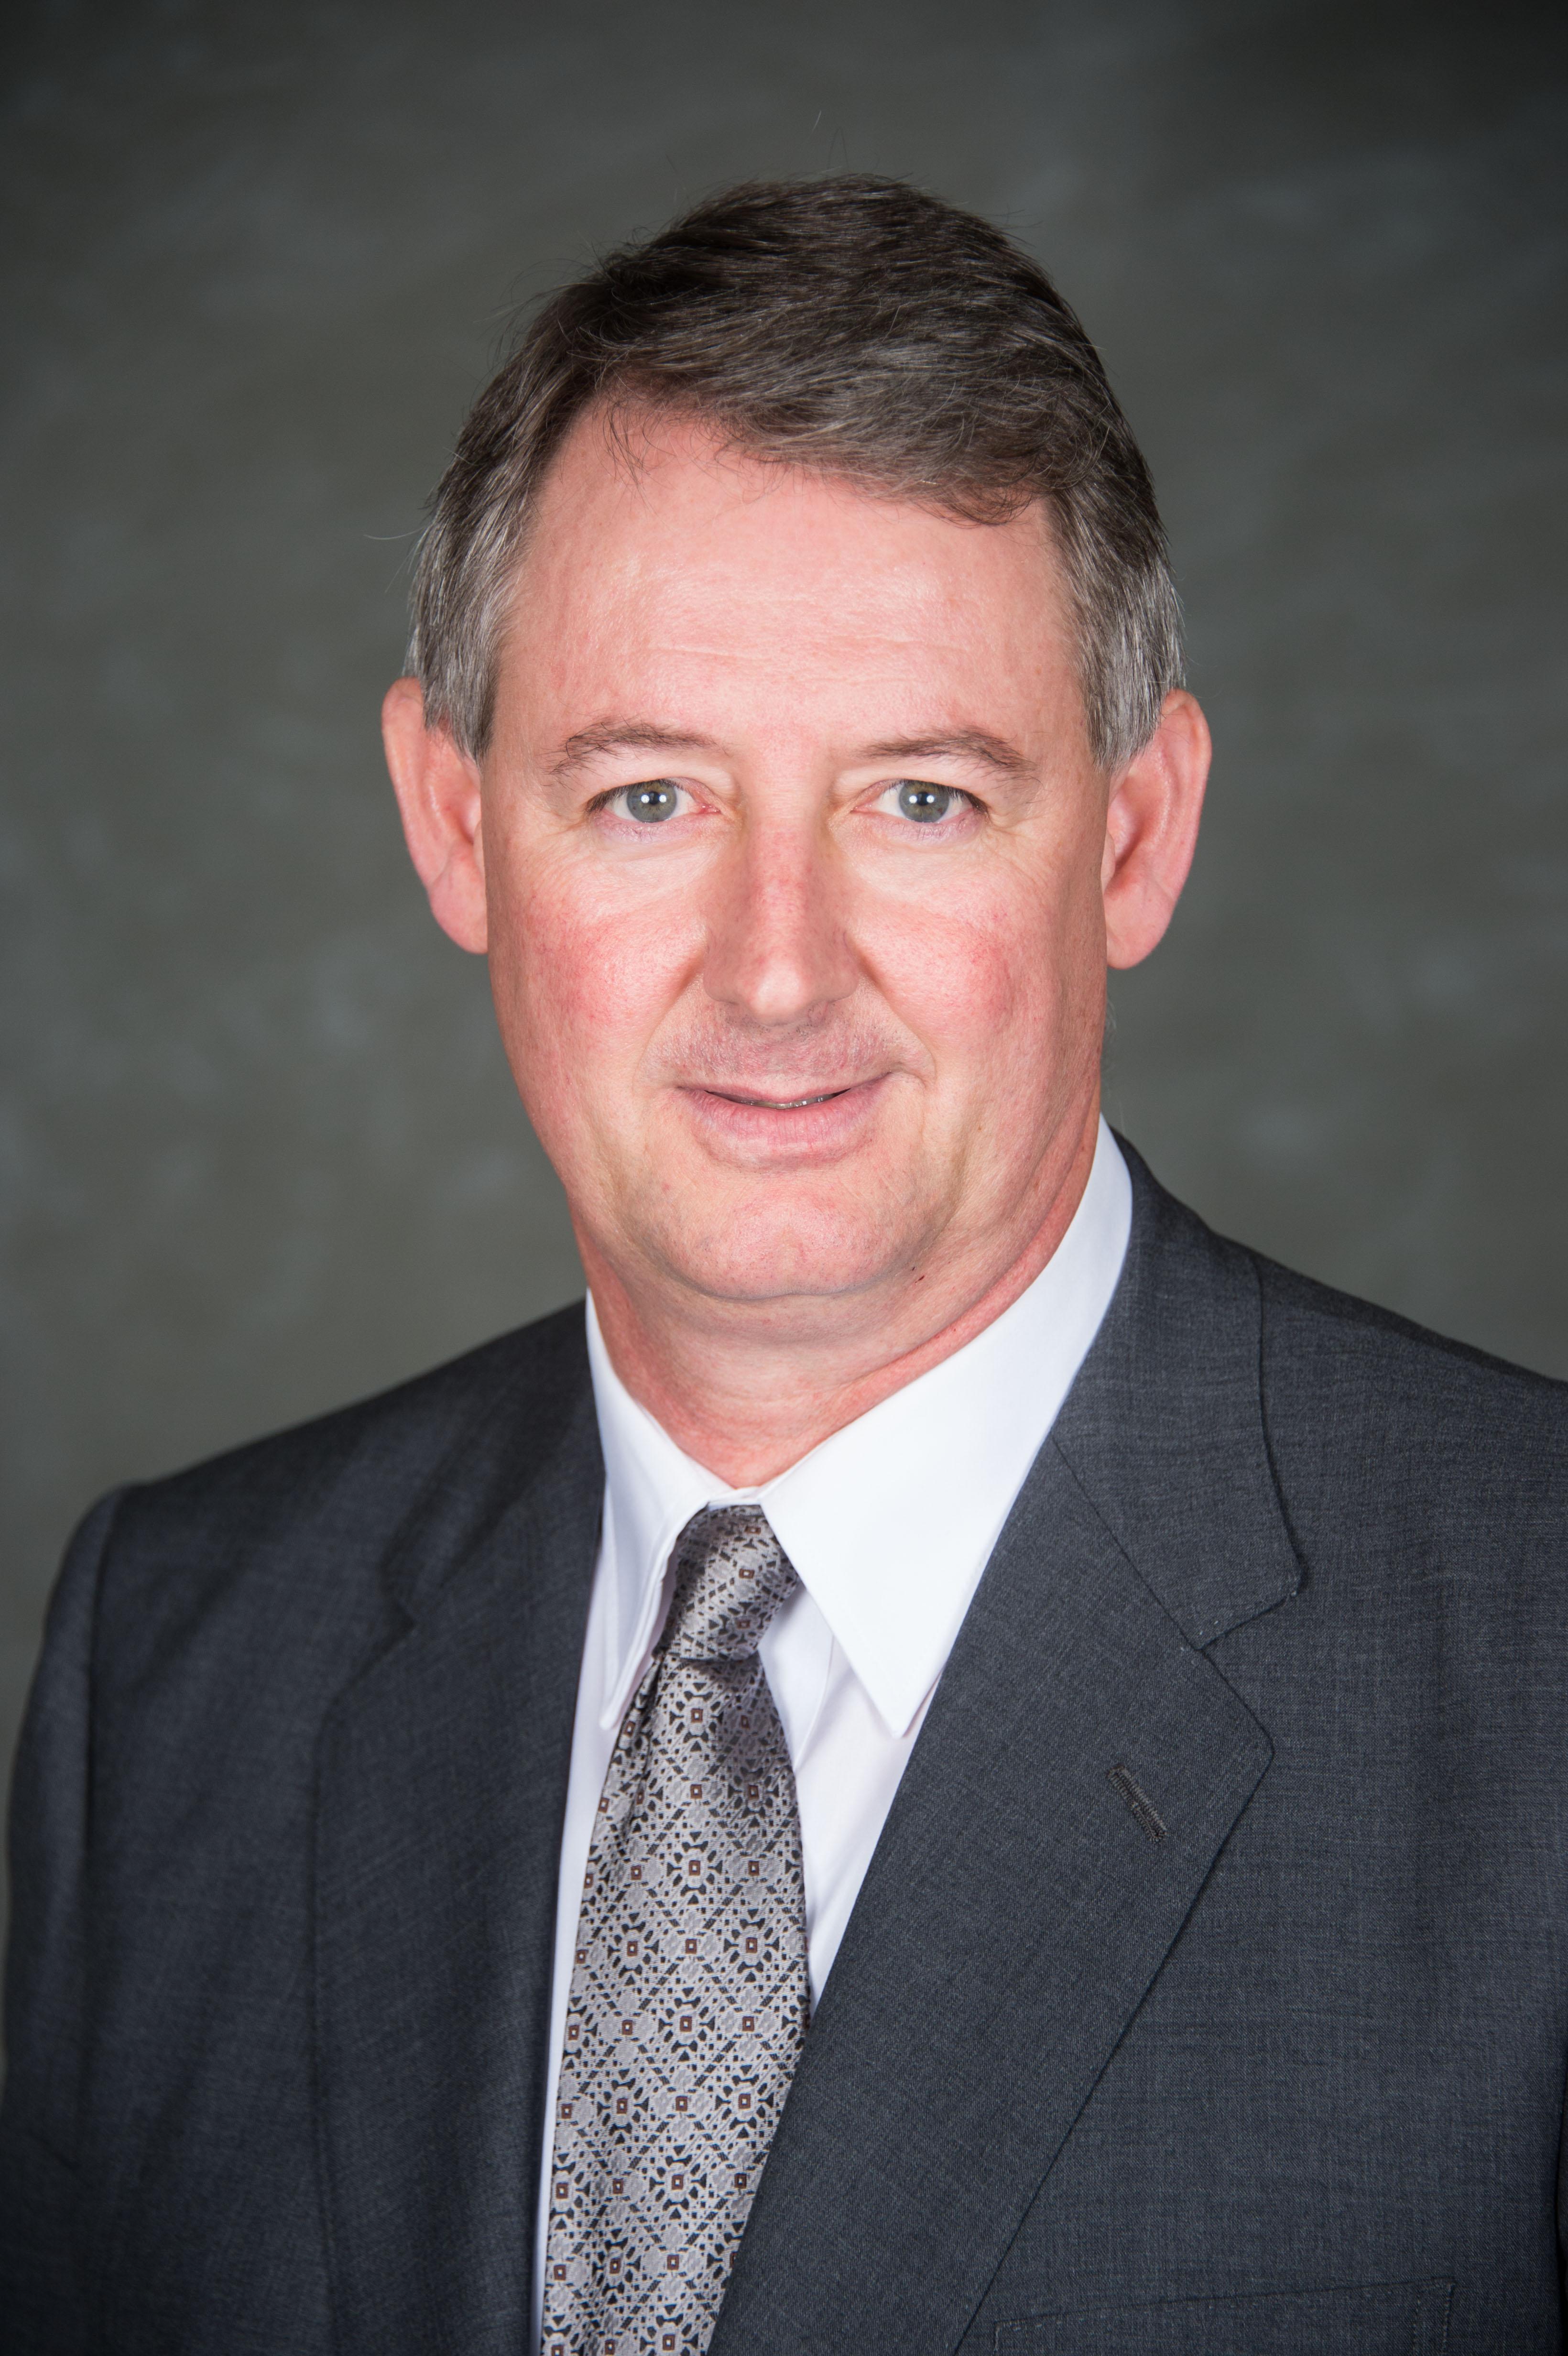 Dr. Kevin M. Doak